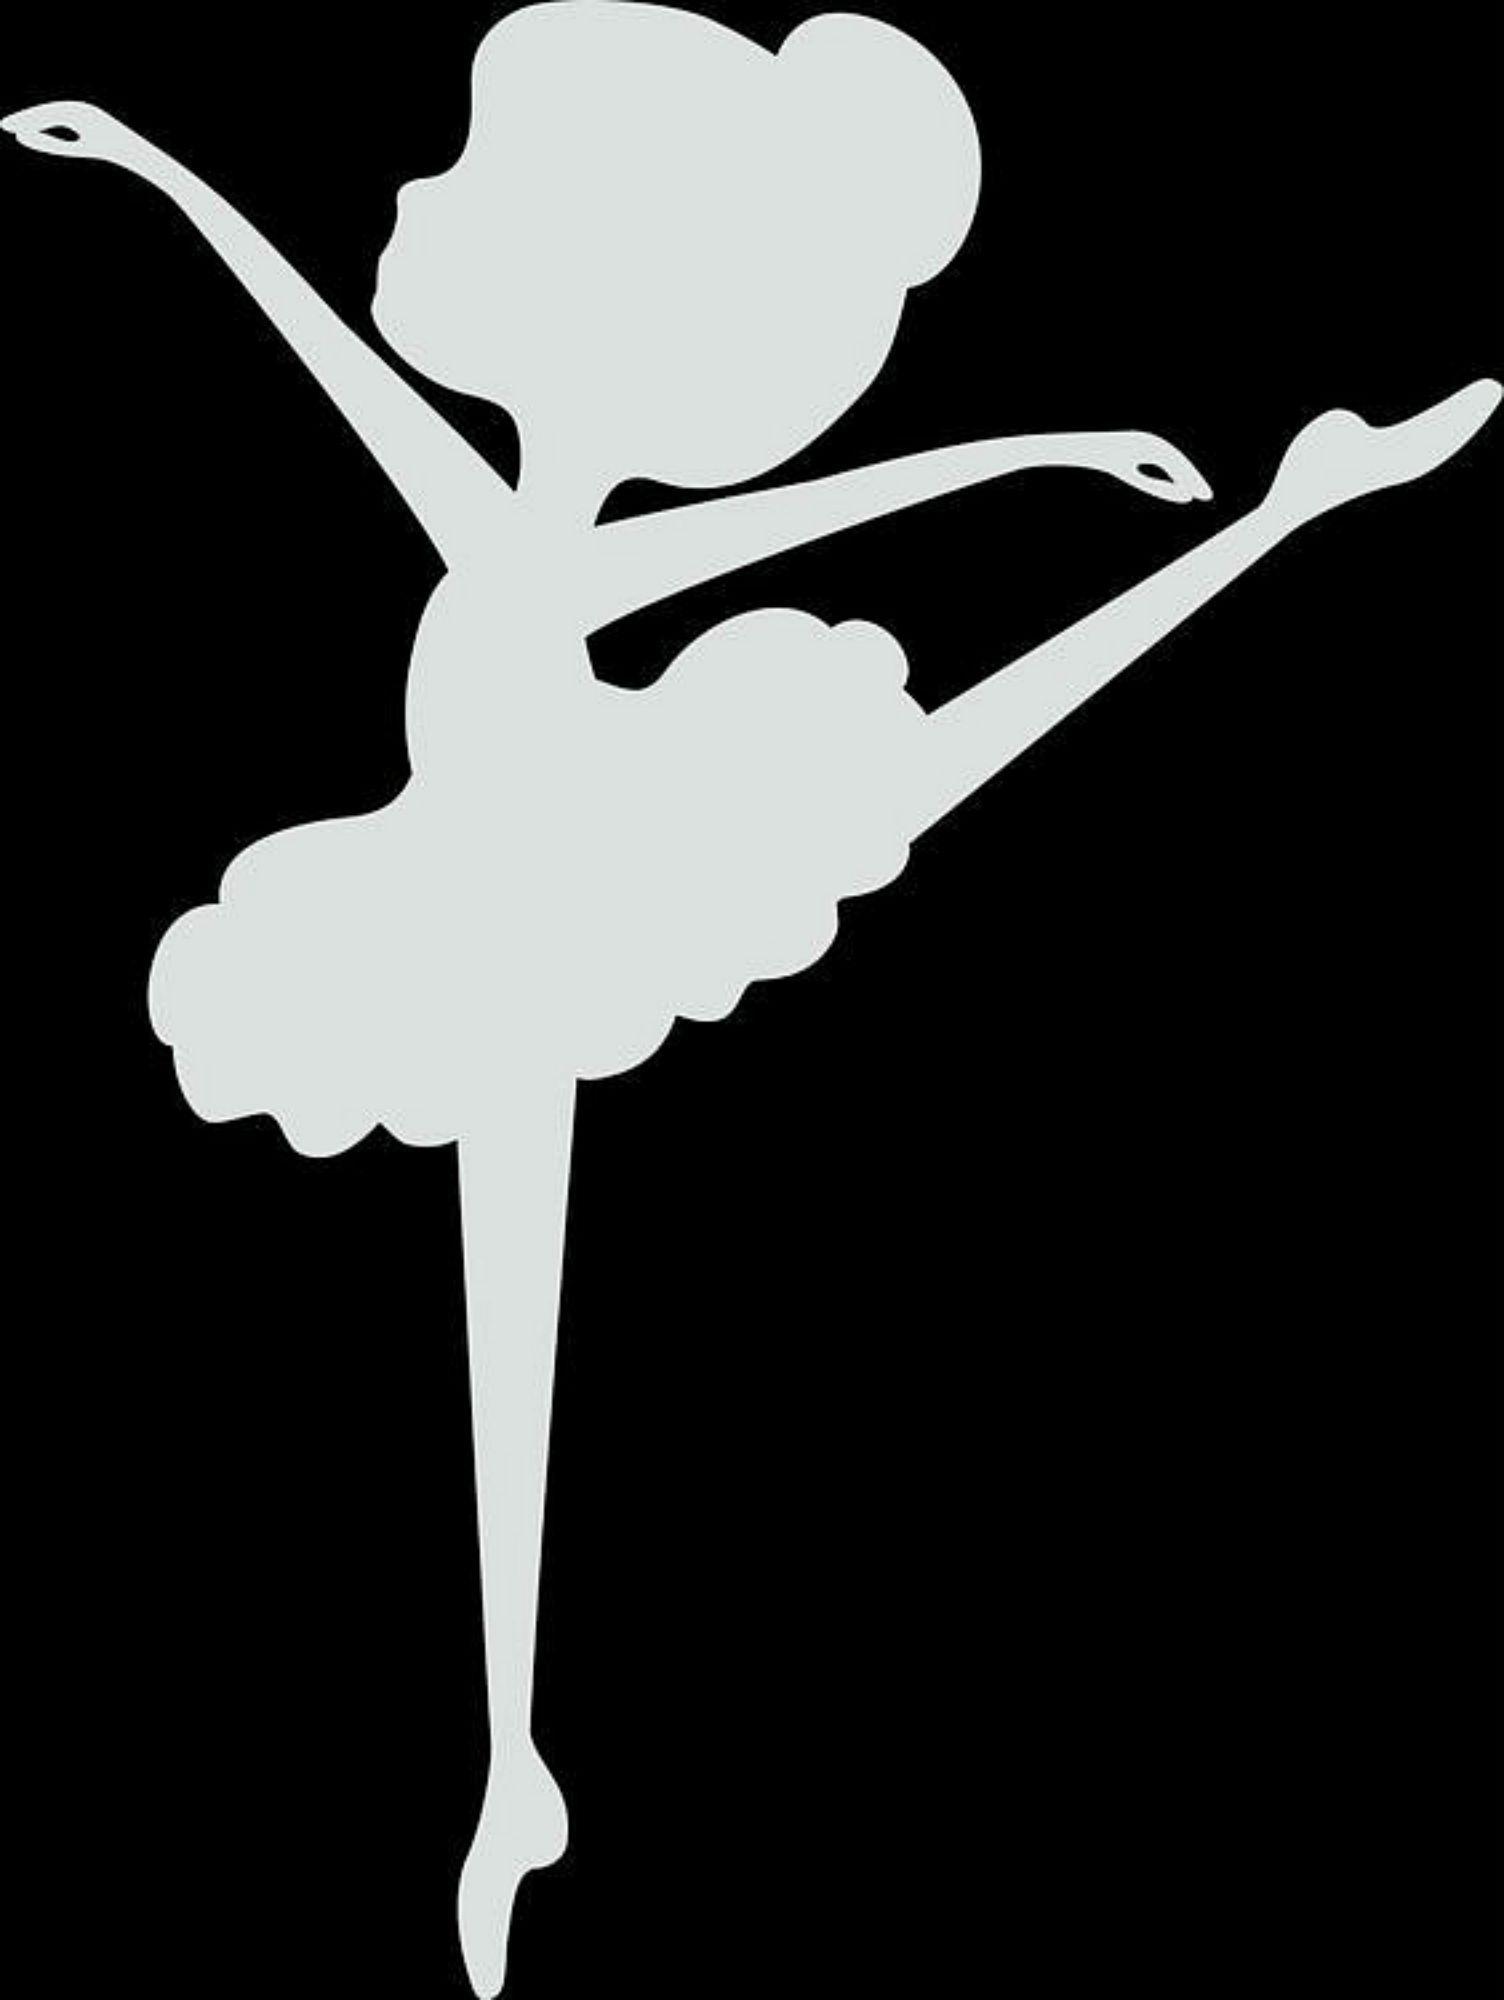 Картинки балерина с бумаги